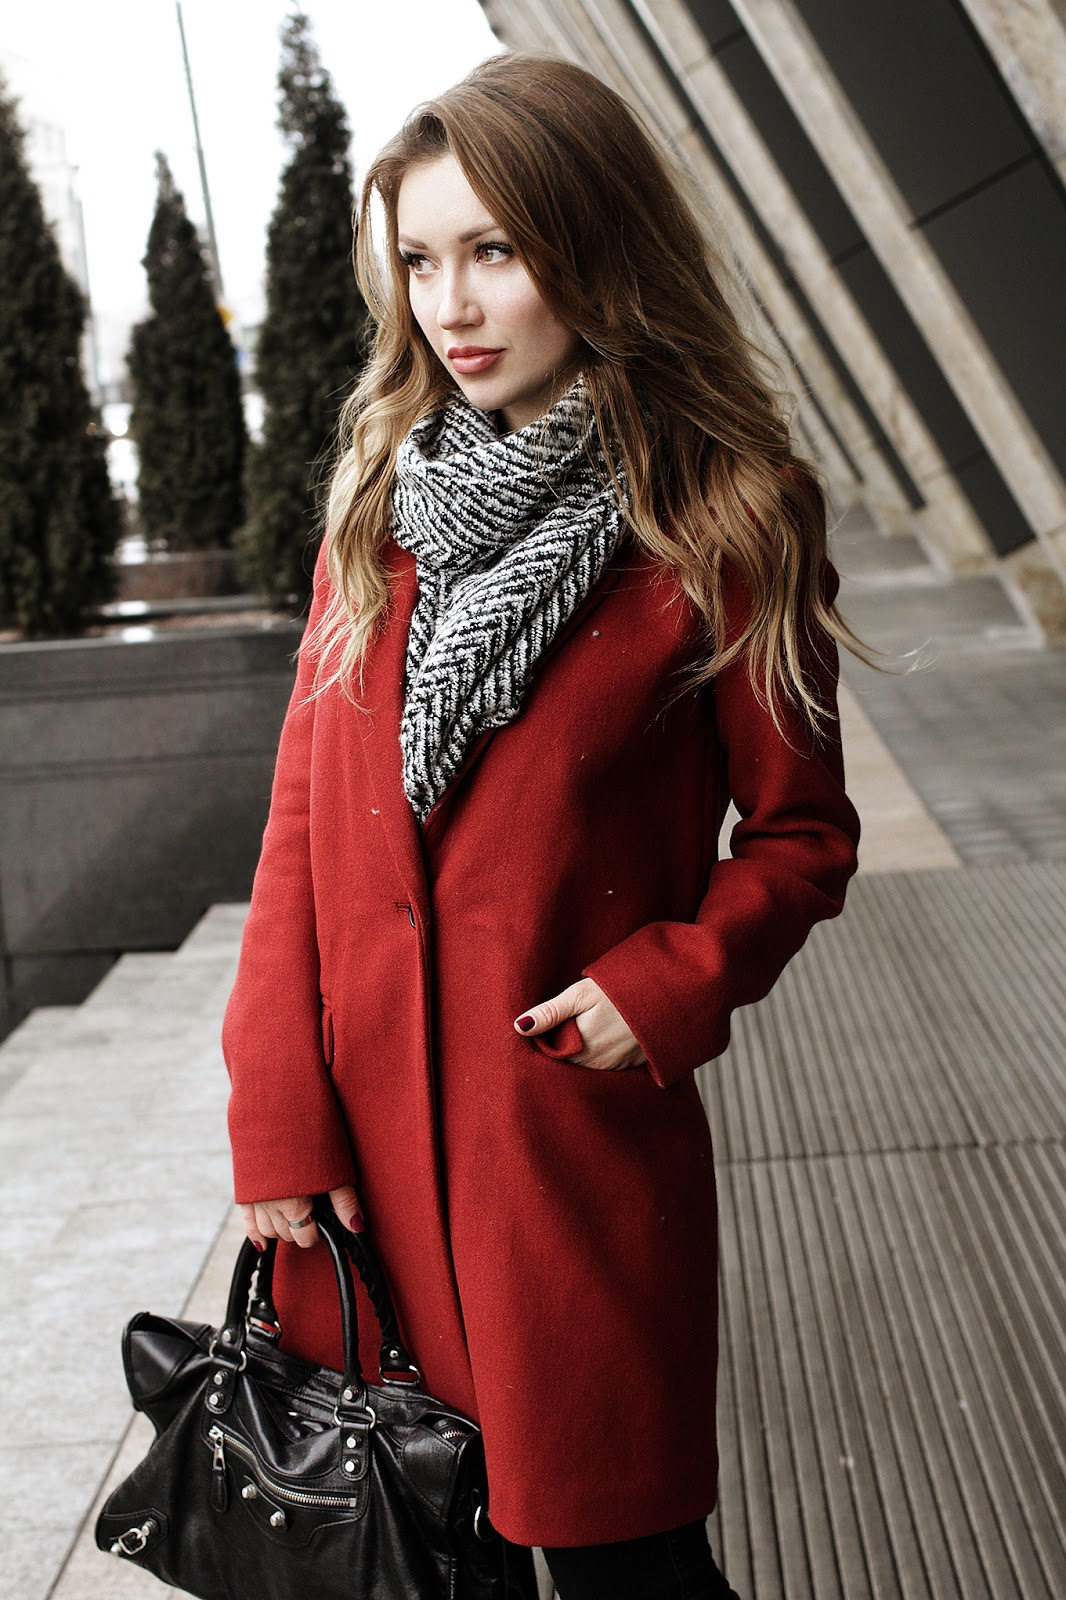 пальто zara, красное пальто zara, zara пальто женское, пальто зара, zara women пальто